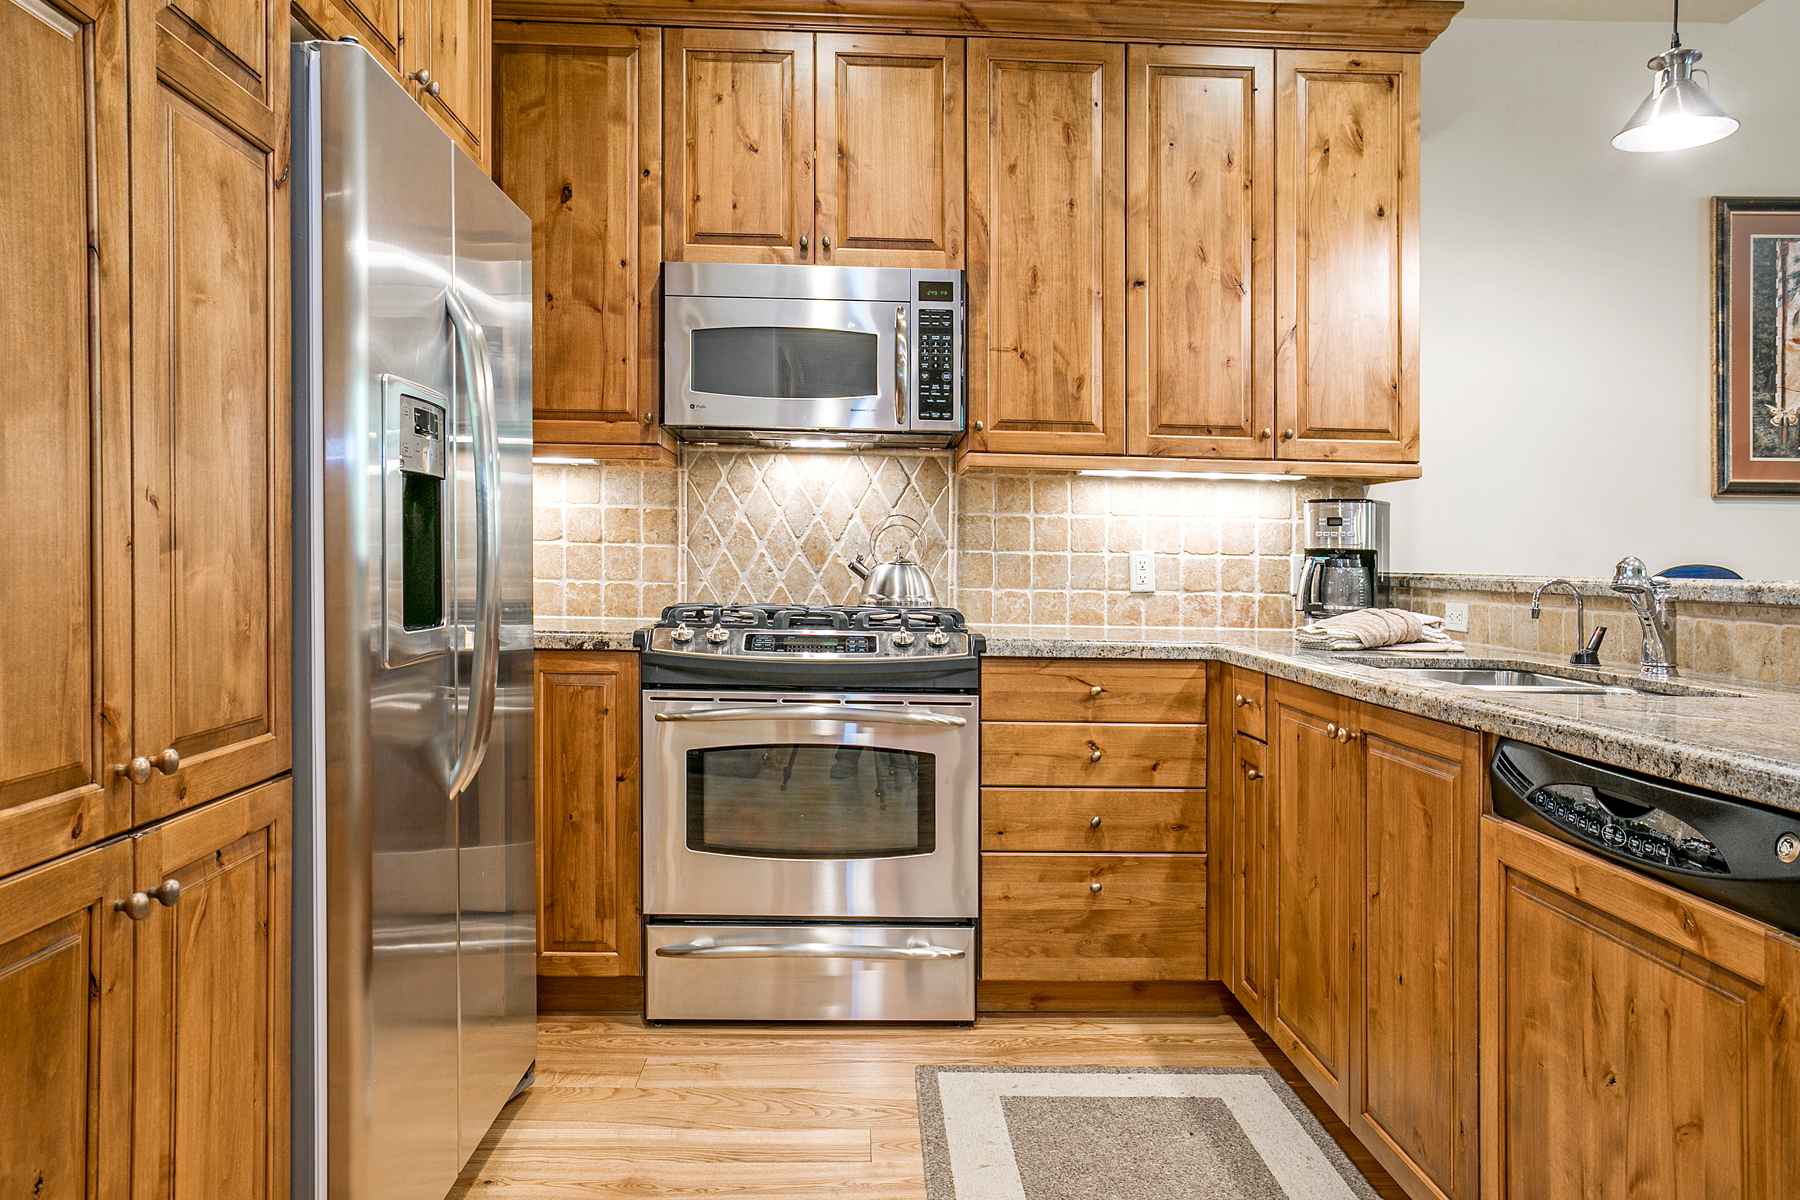 Additional photo for property listing at Beaver Creek Landing B304 300 Prater Rd #B304 Beaver Creek, Colorado 81620 United States